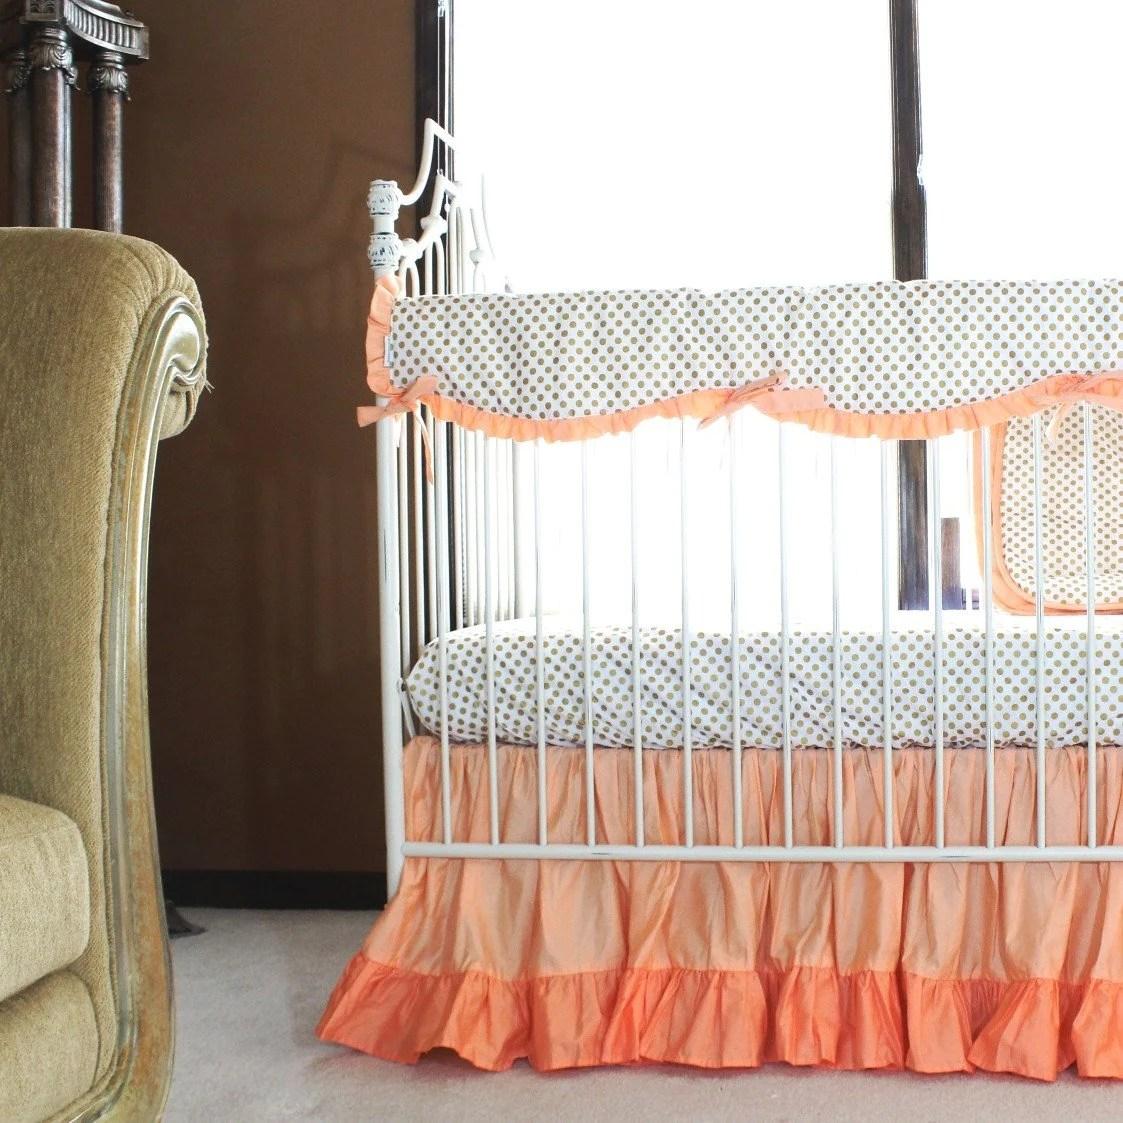 Inspirational Coral Ruffle Crib Bedding Set Daybed Bedding G Dots Coral Ruffle Crib Bedding Set Daybed Bedding Daybed Bedding Sets Full Size Daybed Bedding Sets G Dots Toddlers baby Daybed Bedding Sets